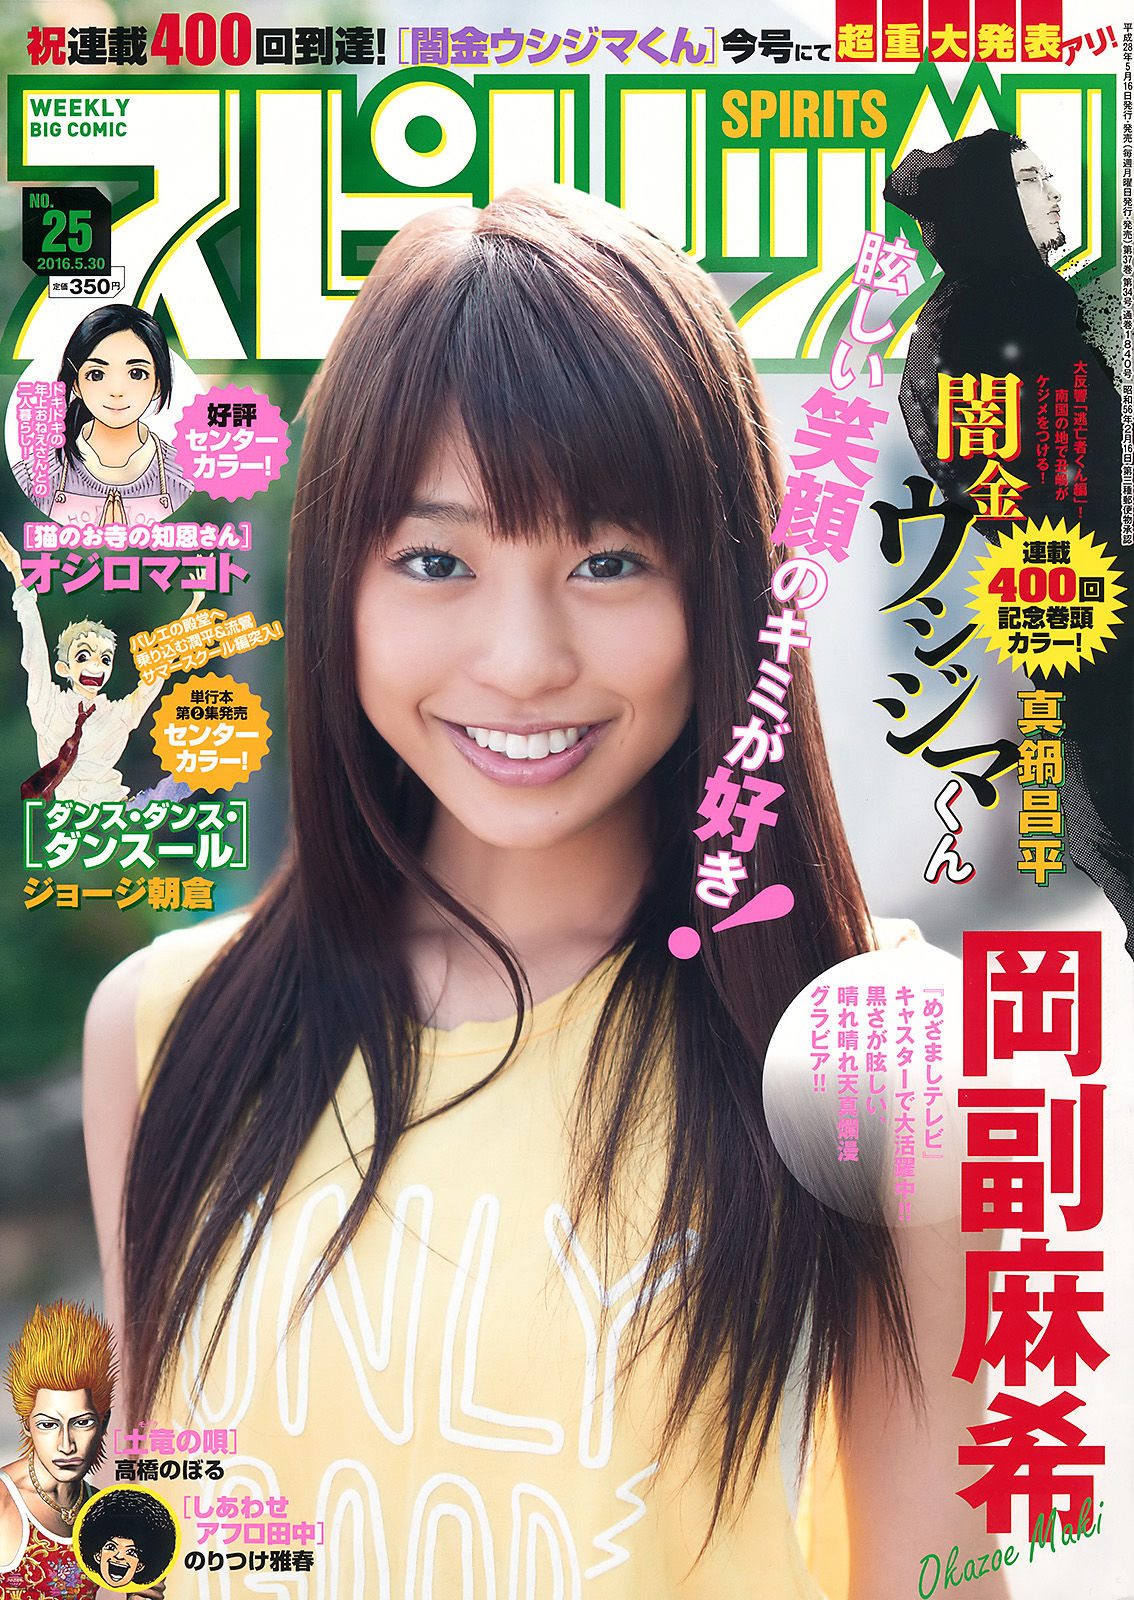 [Weekly Big Comic Spirits杂志写真]冈副麻希(岡副麻希)超高清写真大图片(6P) 751热度